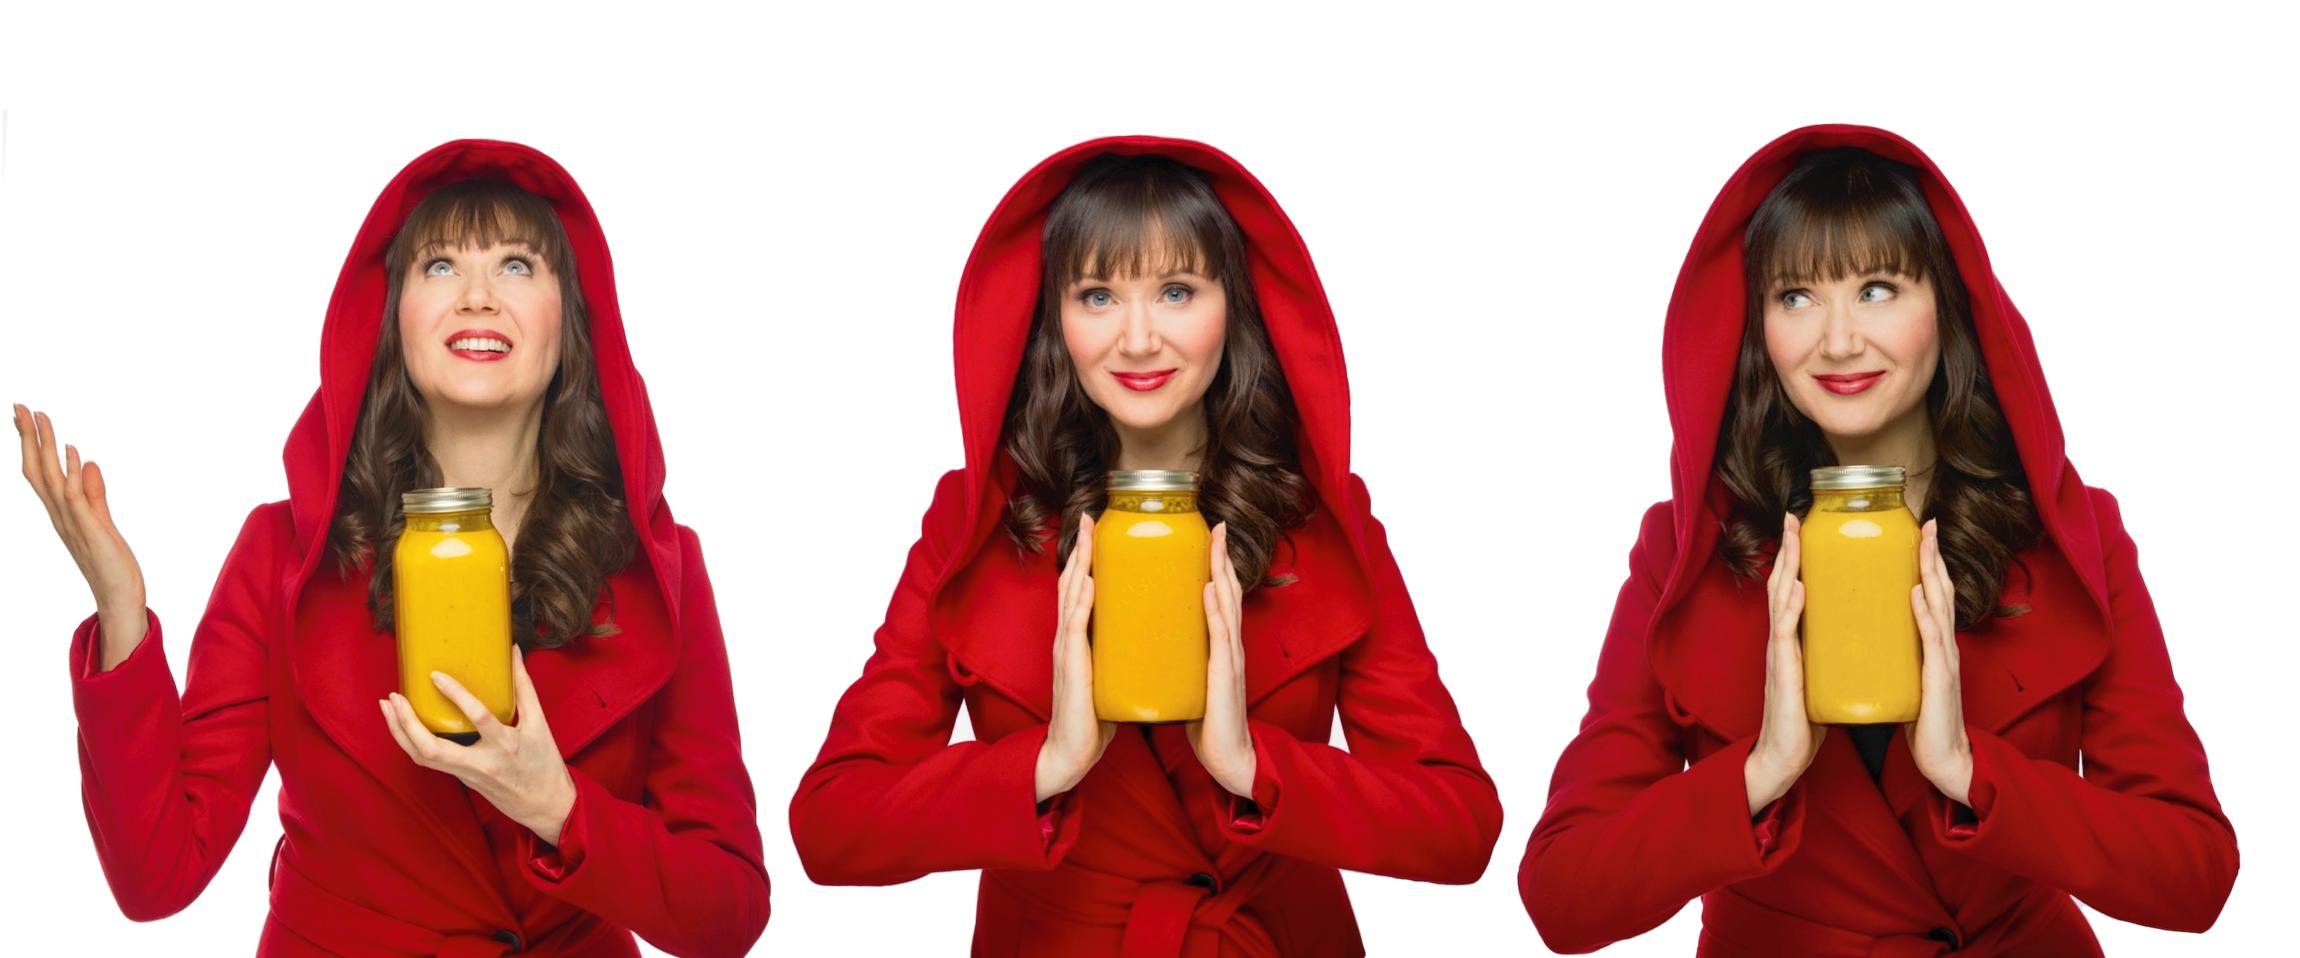 Gallbladder Health | Julie Daniluk's 13 paths to save your